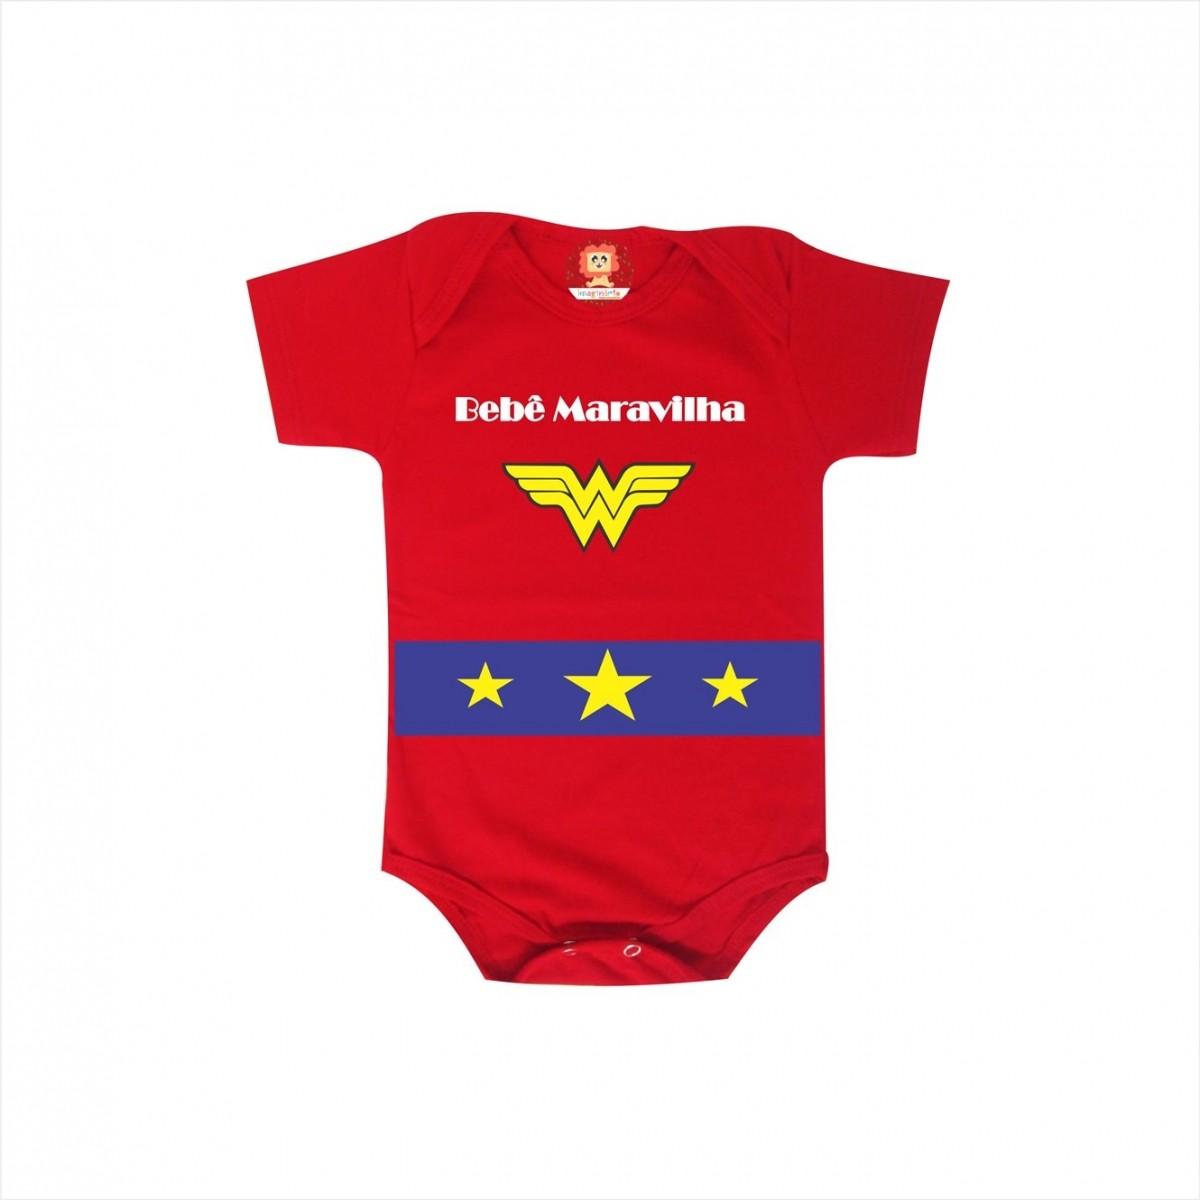 Body e Camiseta Bebê Maravilha